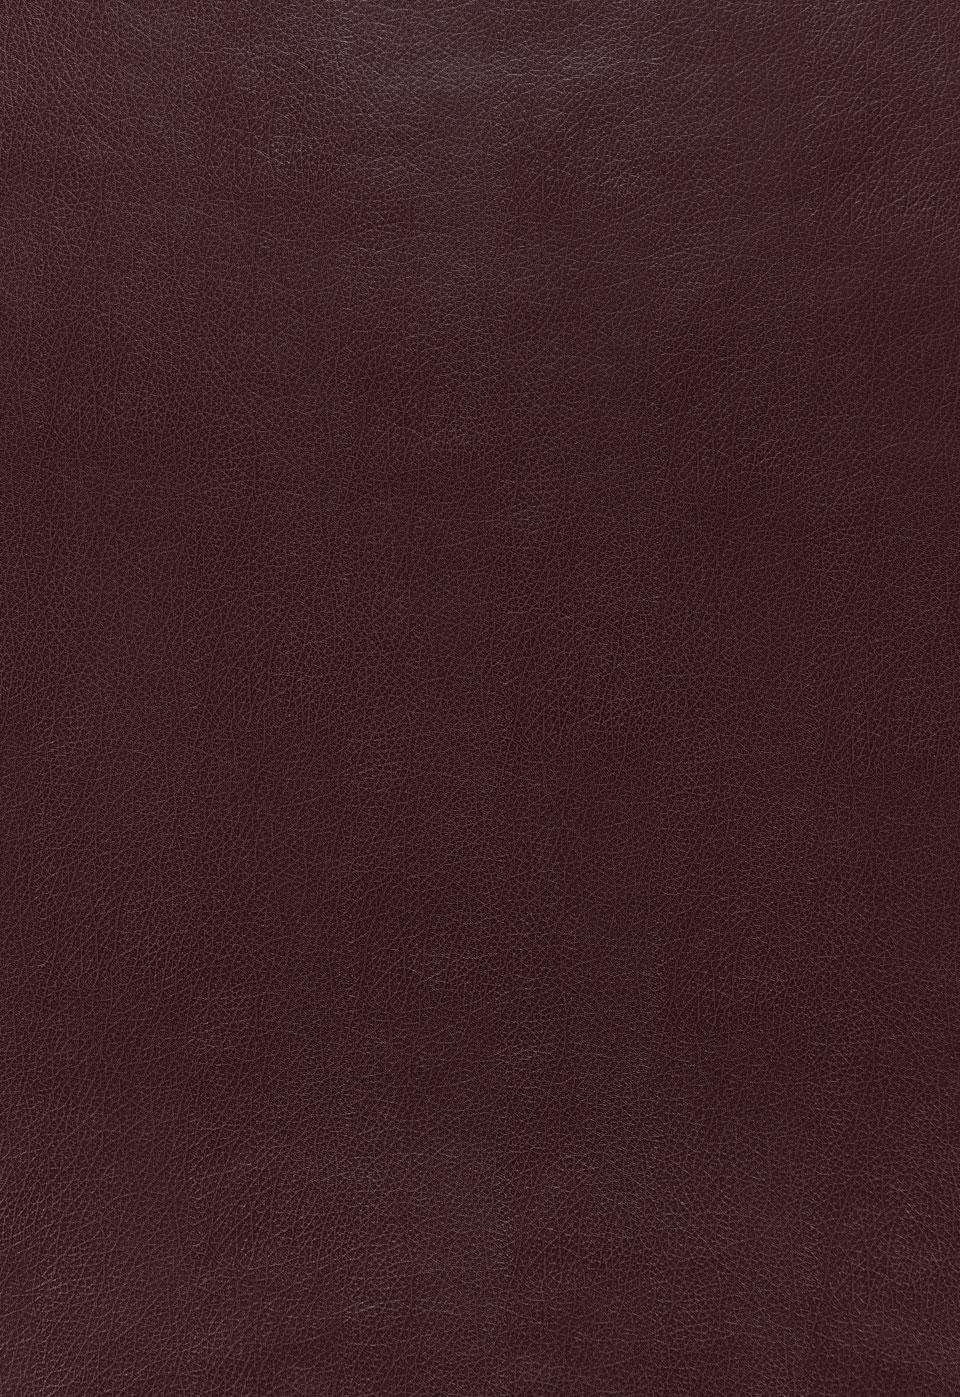 Американские обои Schumacher,  коллекция Luxe Lodge, артикул5006213